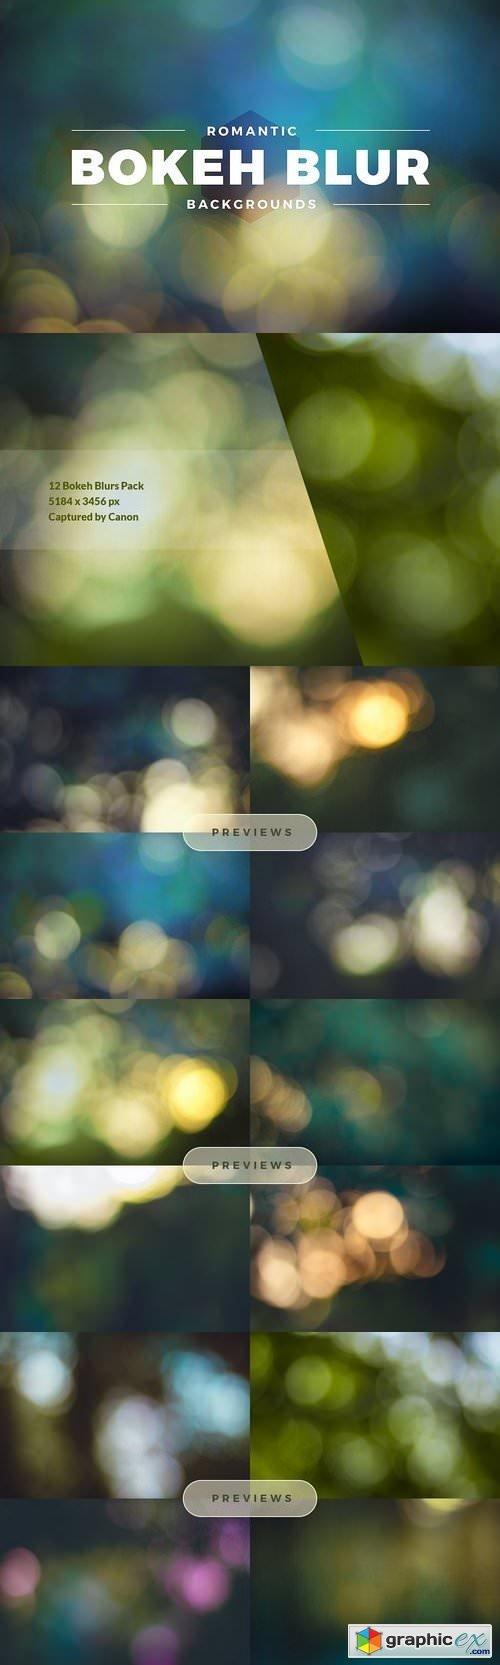 Romantic Bokeh Blur Backgrounds Pack